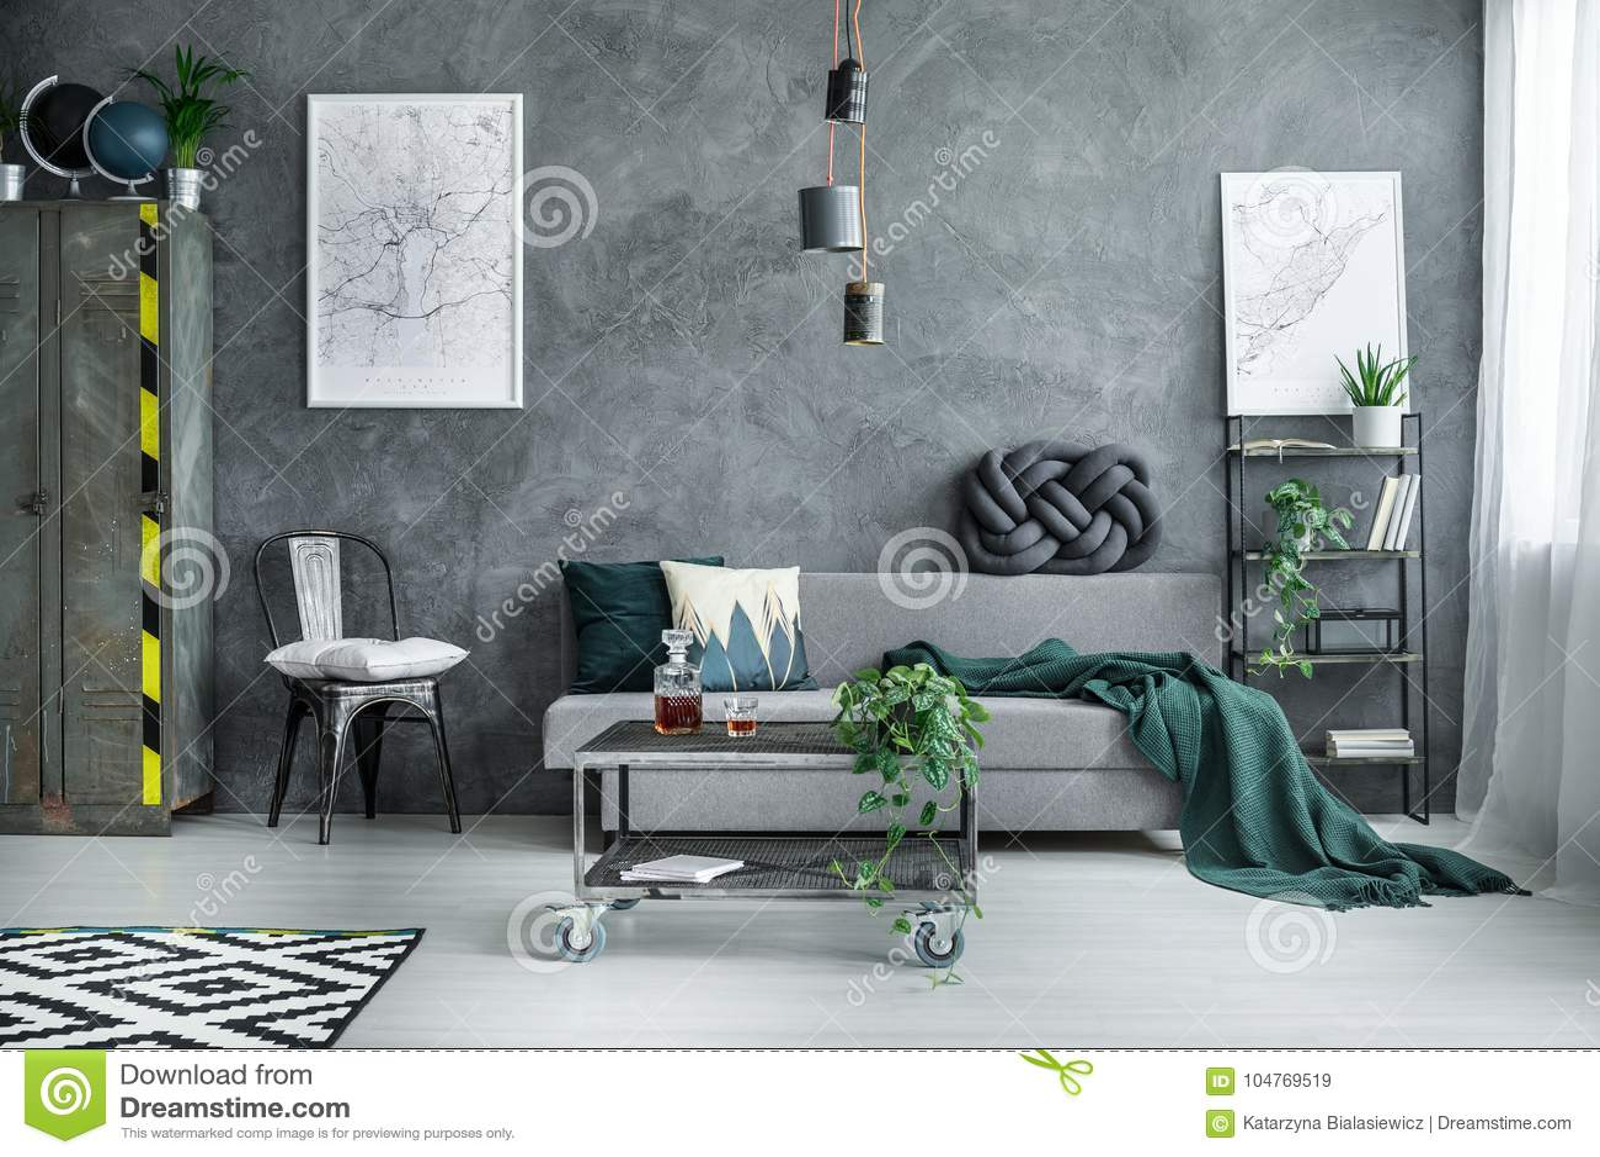 Donkere Industriële Woonkamer Stock Afbeelding - Afbeelding ...